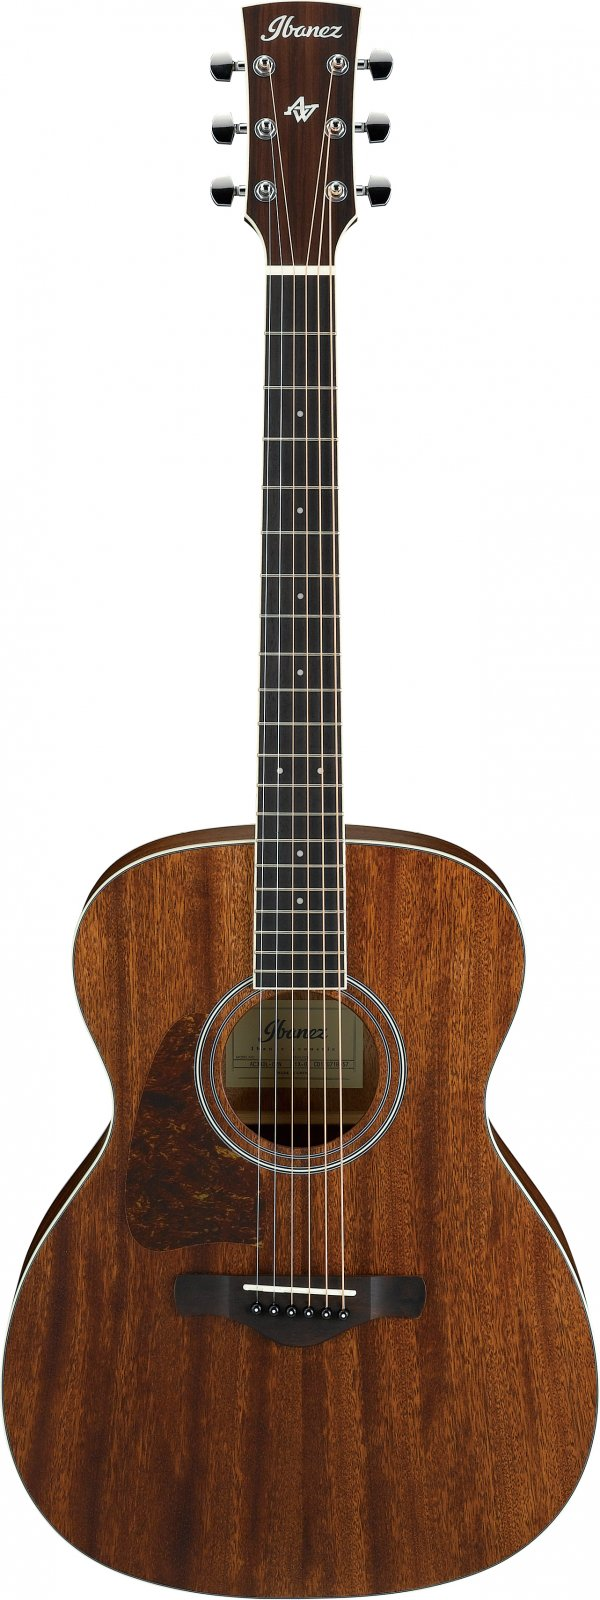 Ibanez AC340-L-OPN Left-Handed Grand Concert Acoustic Guitar